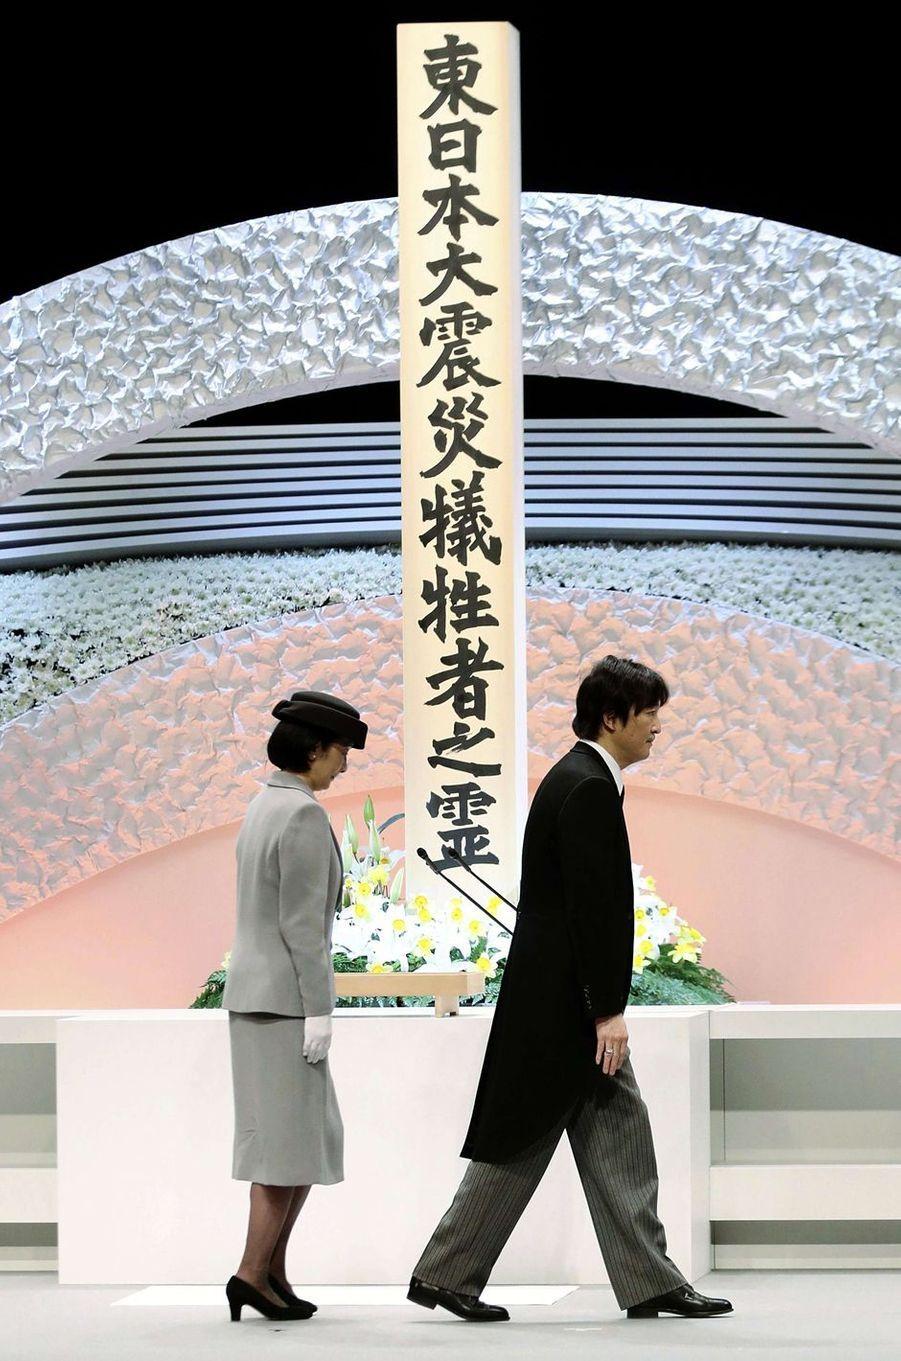 La princesse Kiko du Japon et le prince Fumihito d'Akishino à Tokyo, le 11 mars 2019